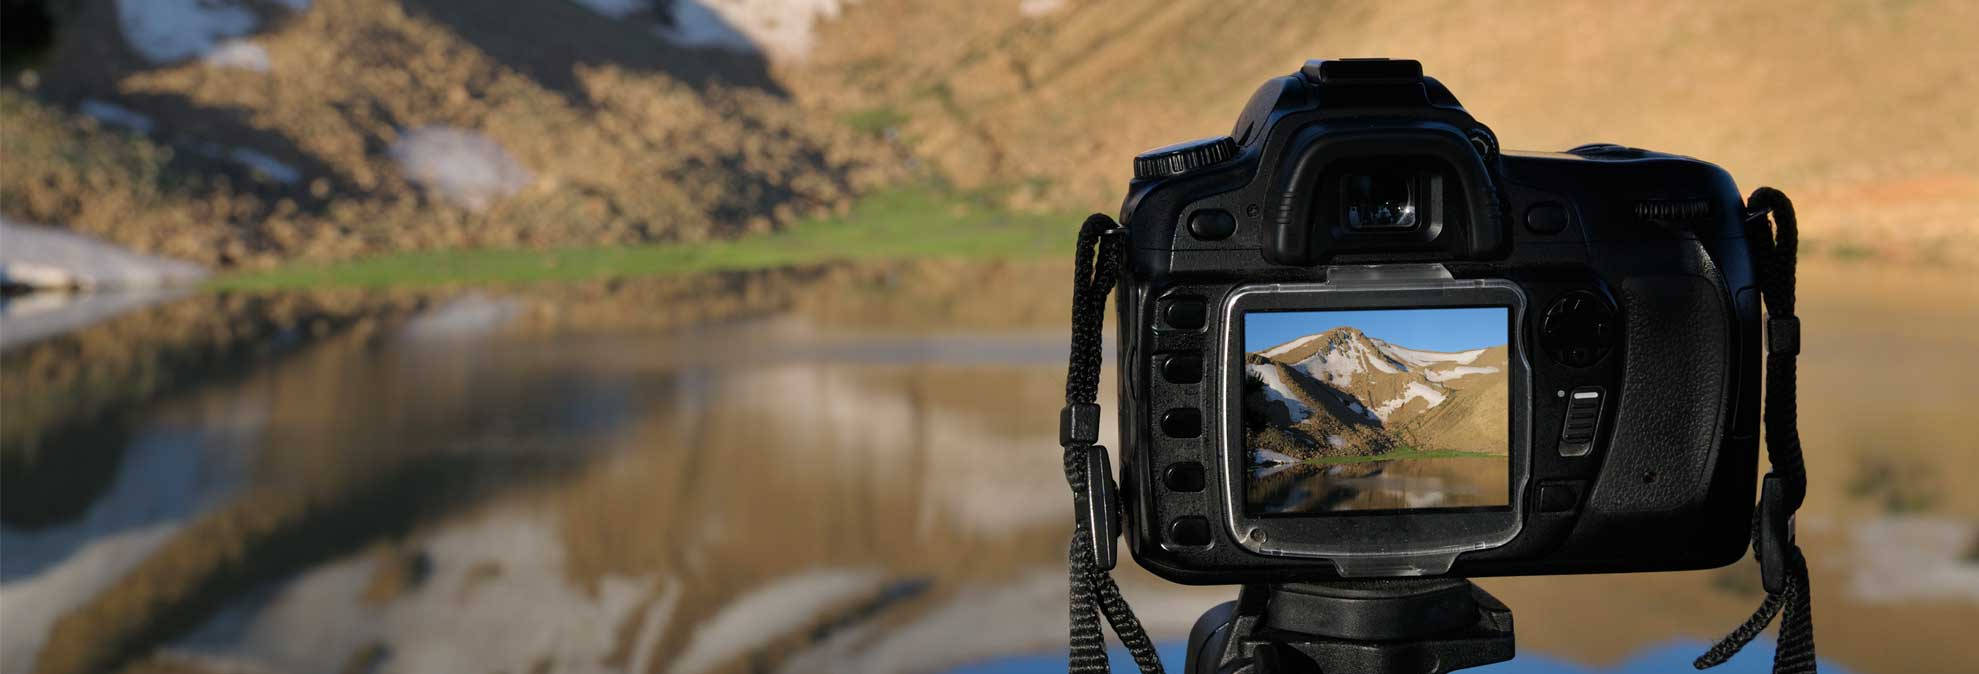 Best camera buying guide consumer reports for Camera camera camera